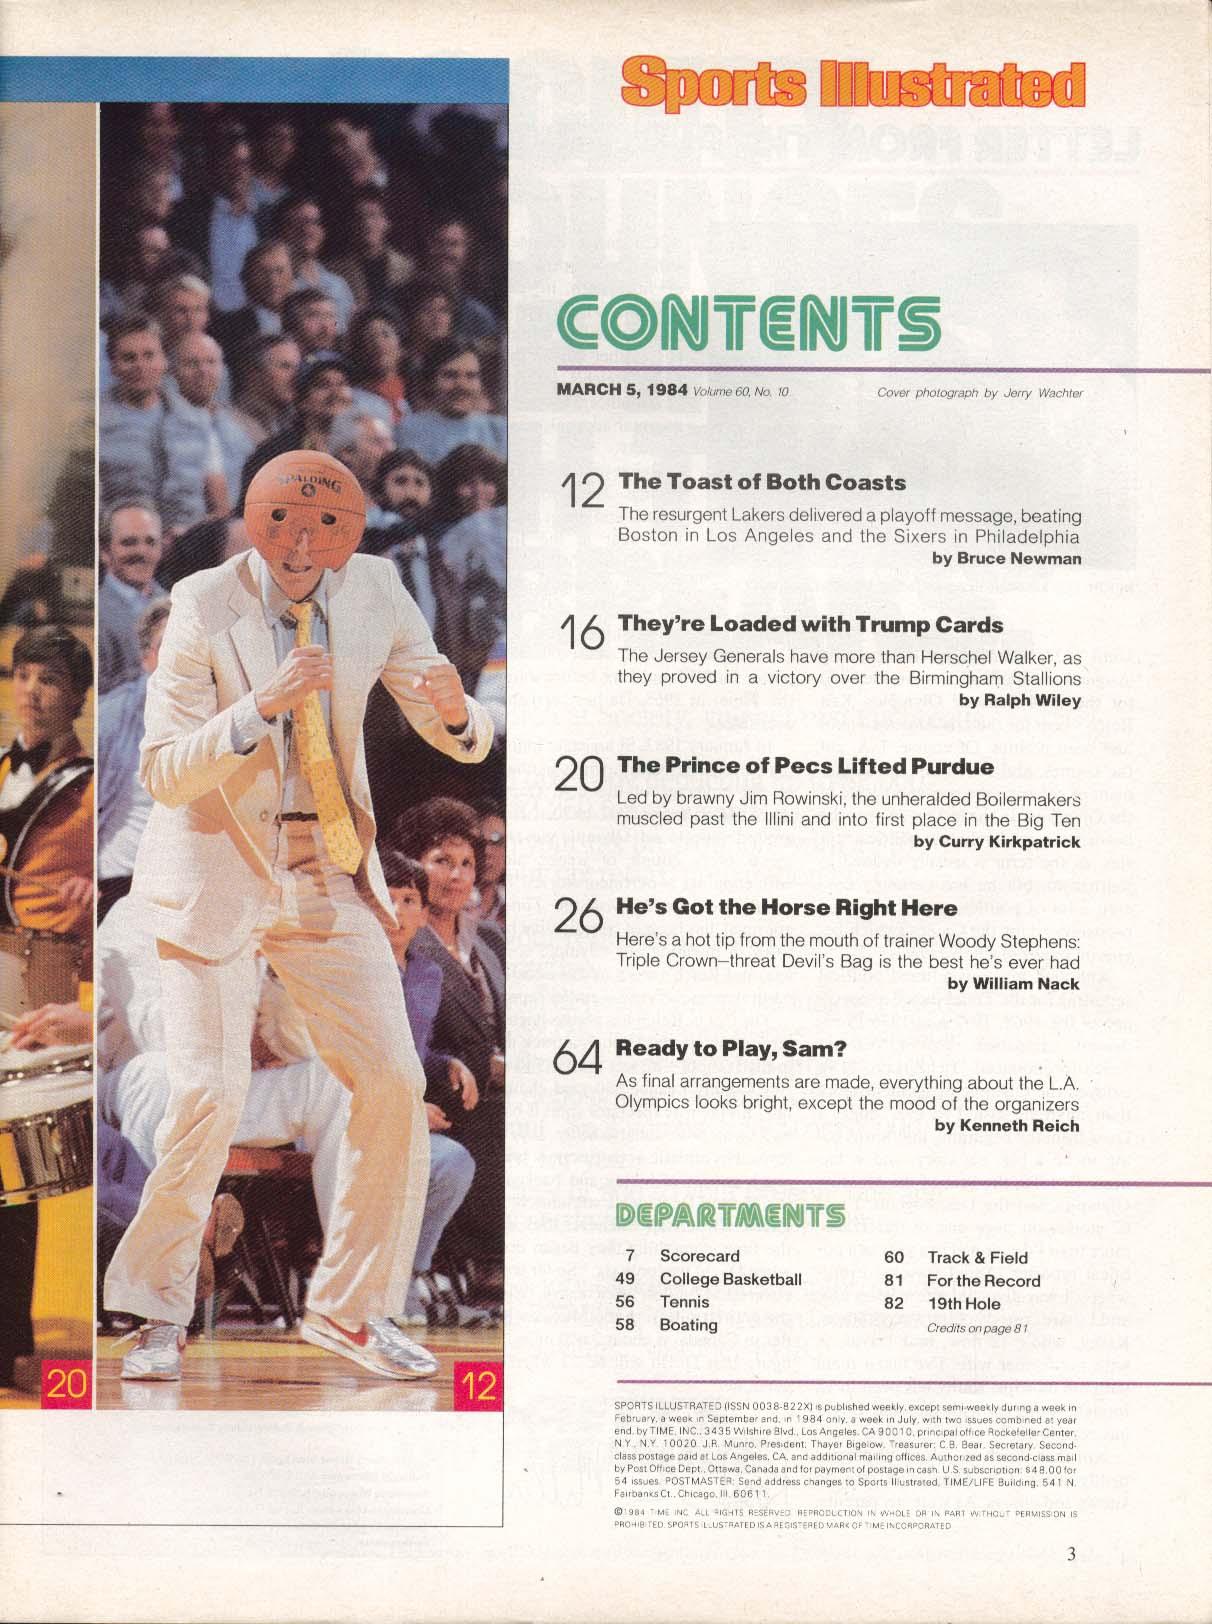 SPORTS ILLUSTRATED Magic Johnson Herschel Walker Jim Rowinski 3/5 1984